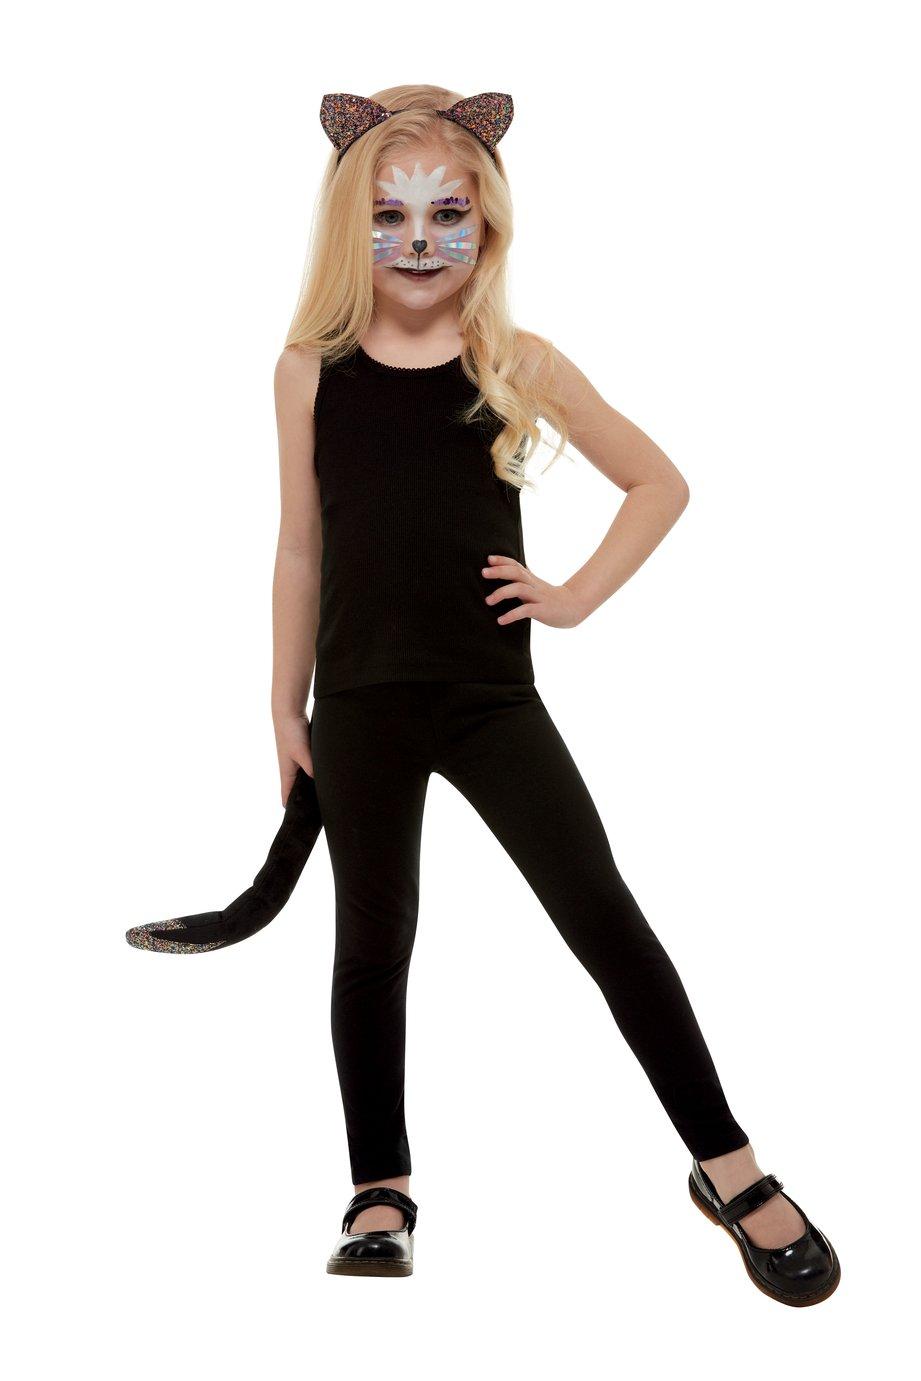 Illusions Halloween Dark Glitter Cat Dress Up Set